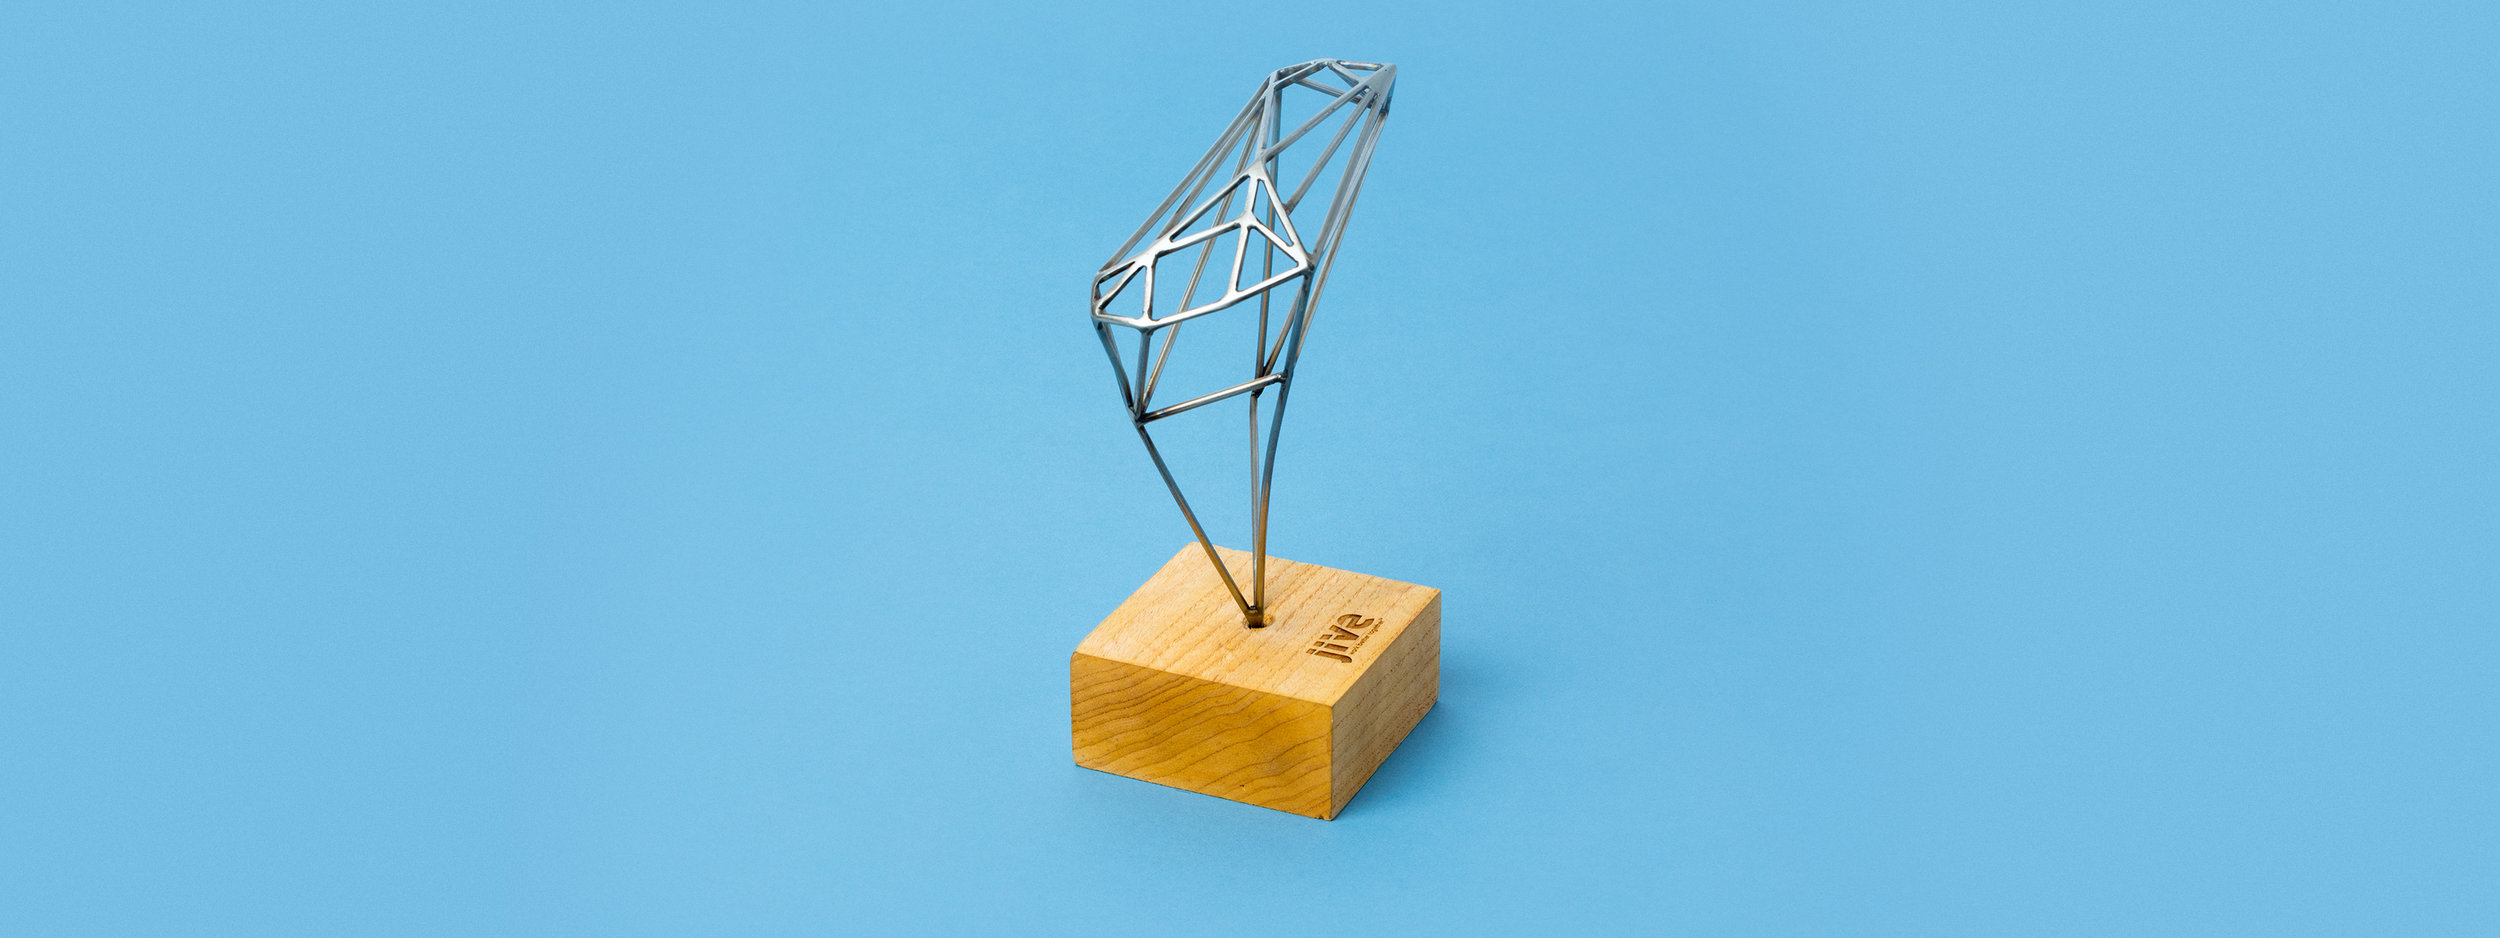 custom award, trophy, design, laser cut acrylic, laser cut wood, engraved wood, welded steel, portland, OR, jive